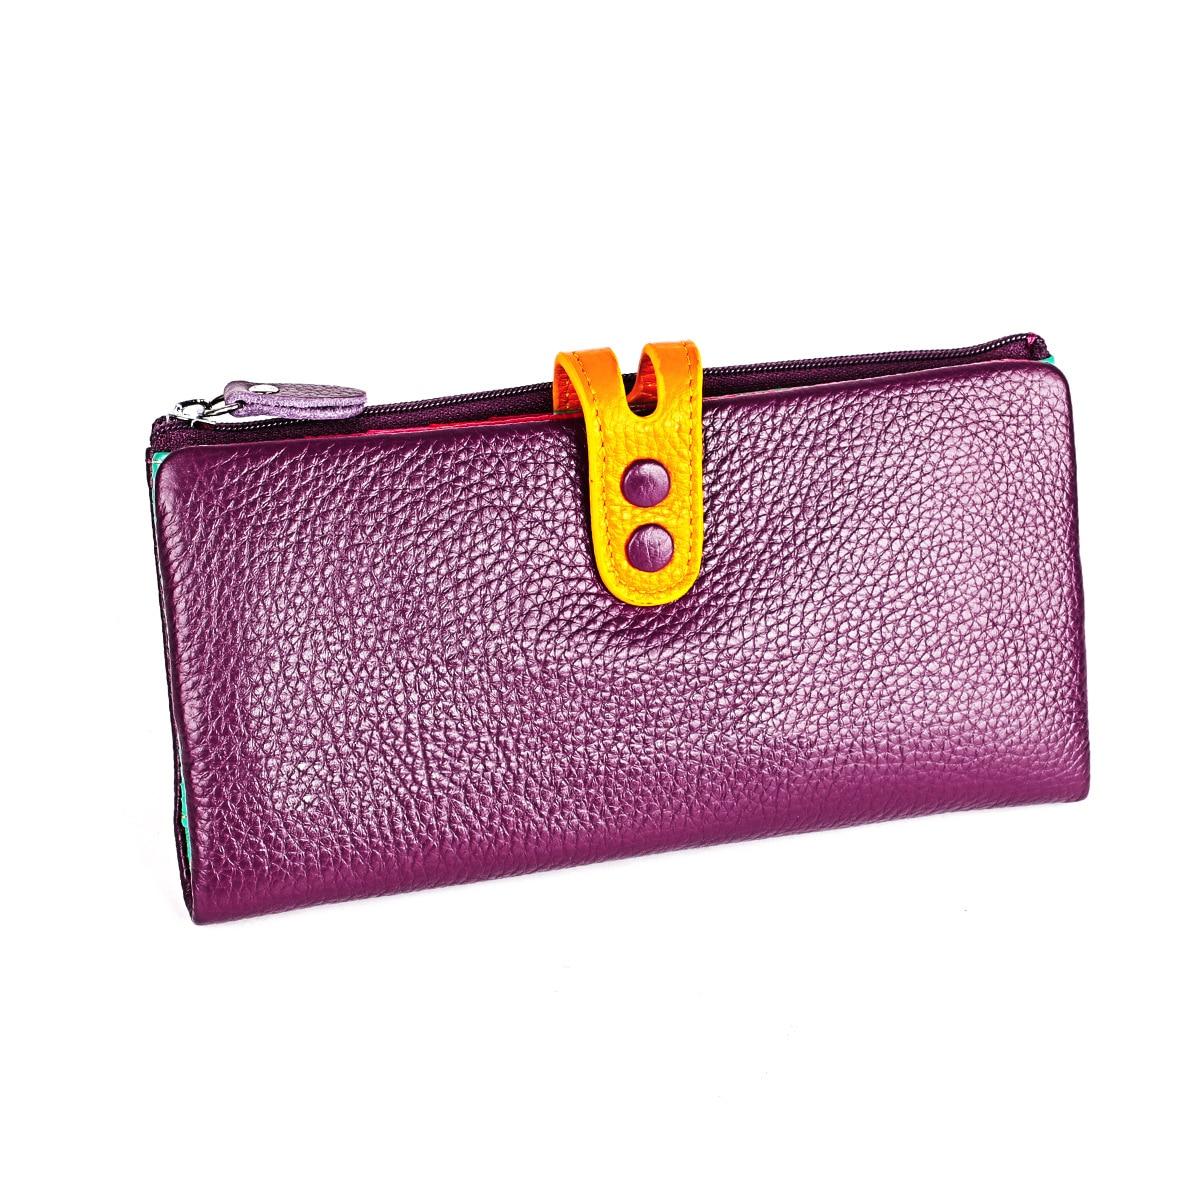 Image 2 - 女性本革財布カラフルな女性ロングリアルレザークラッチ財布女性ジッパー電話コイン財布札入れ女性のバッグ財布   -